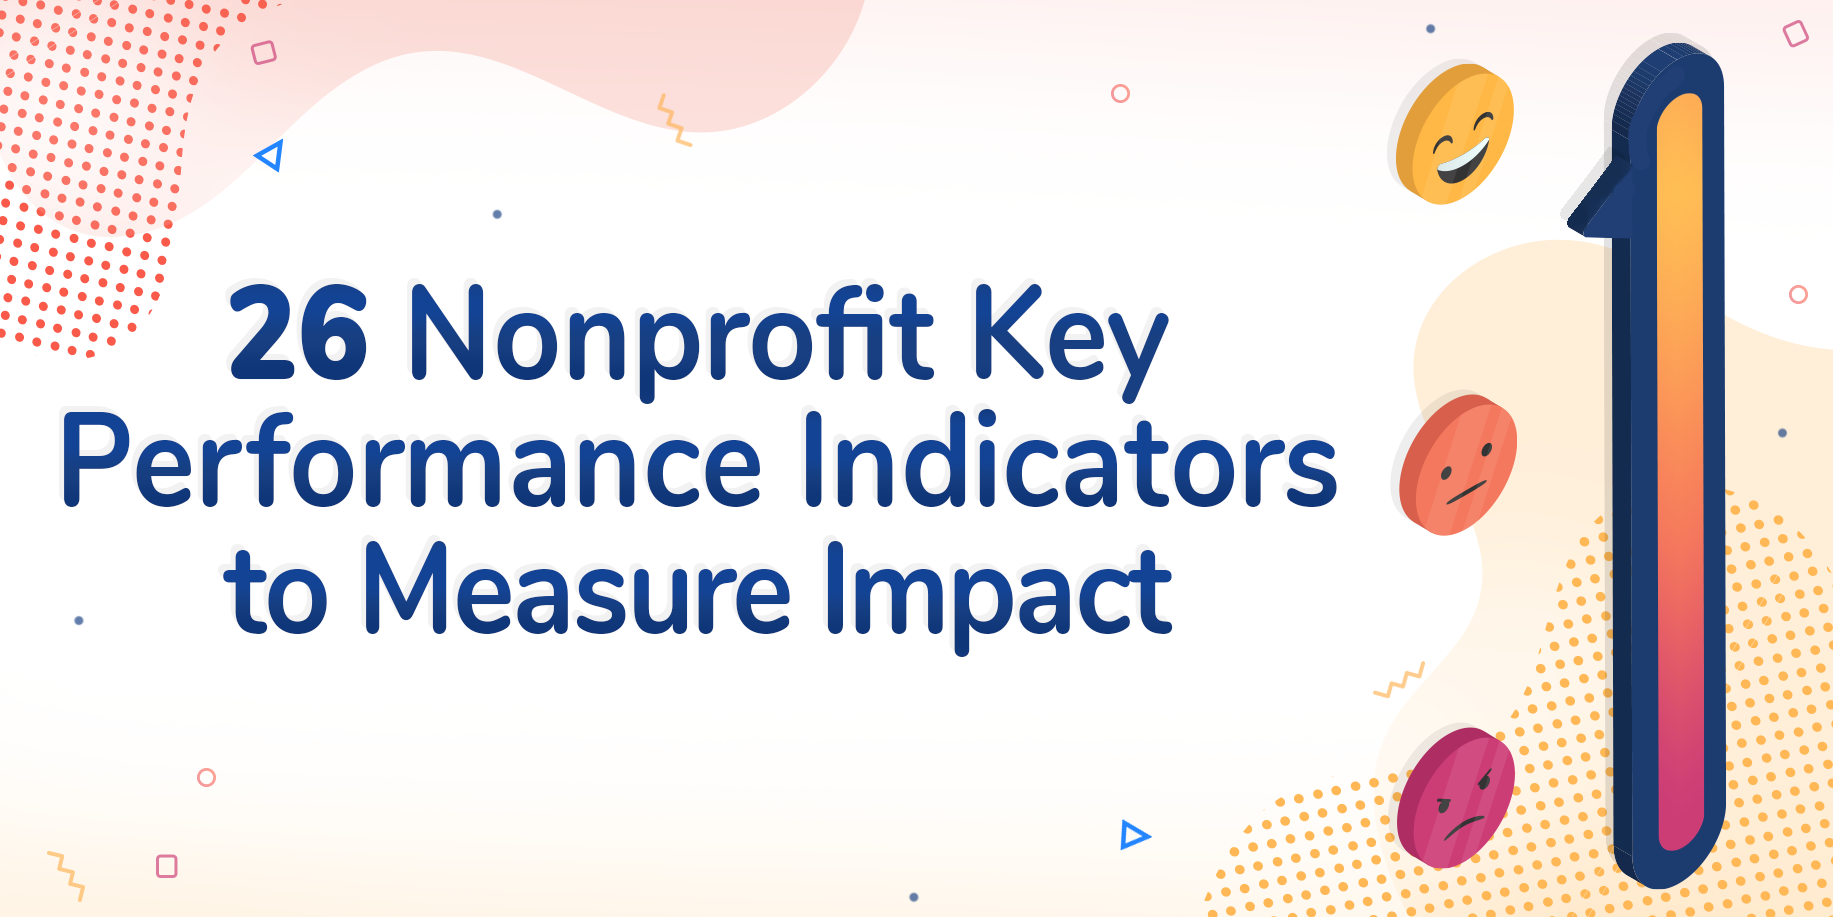 26 Nonprofit Key Performance Indicators to Measure Impact